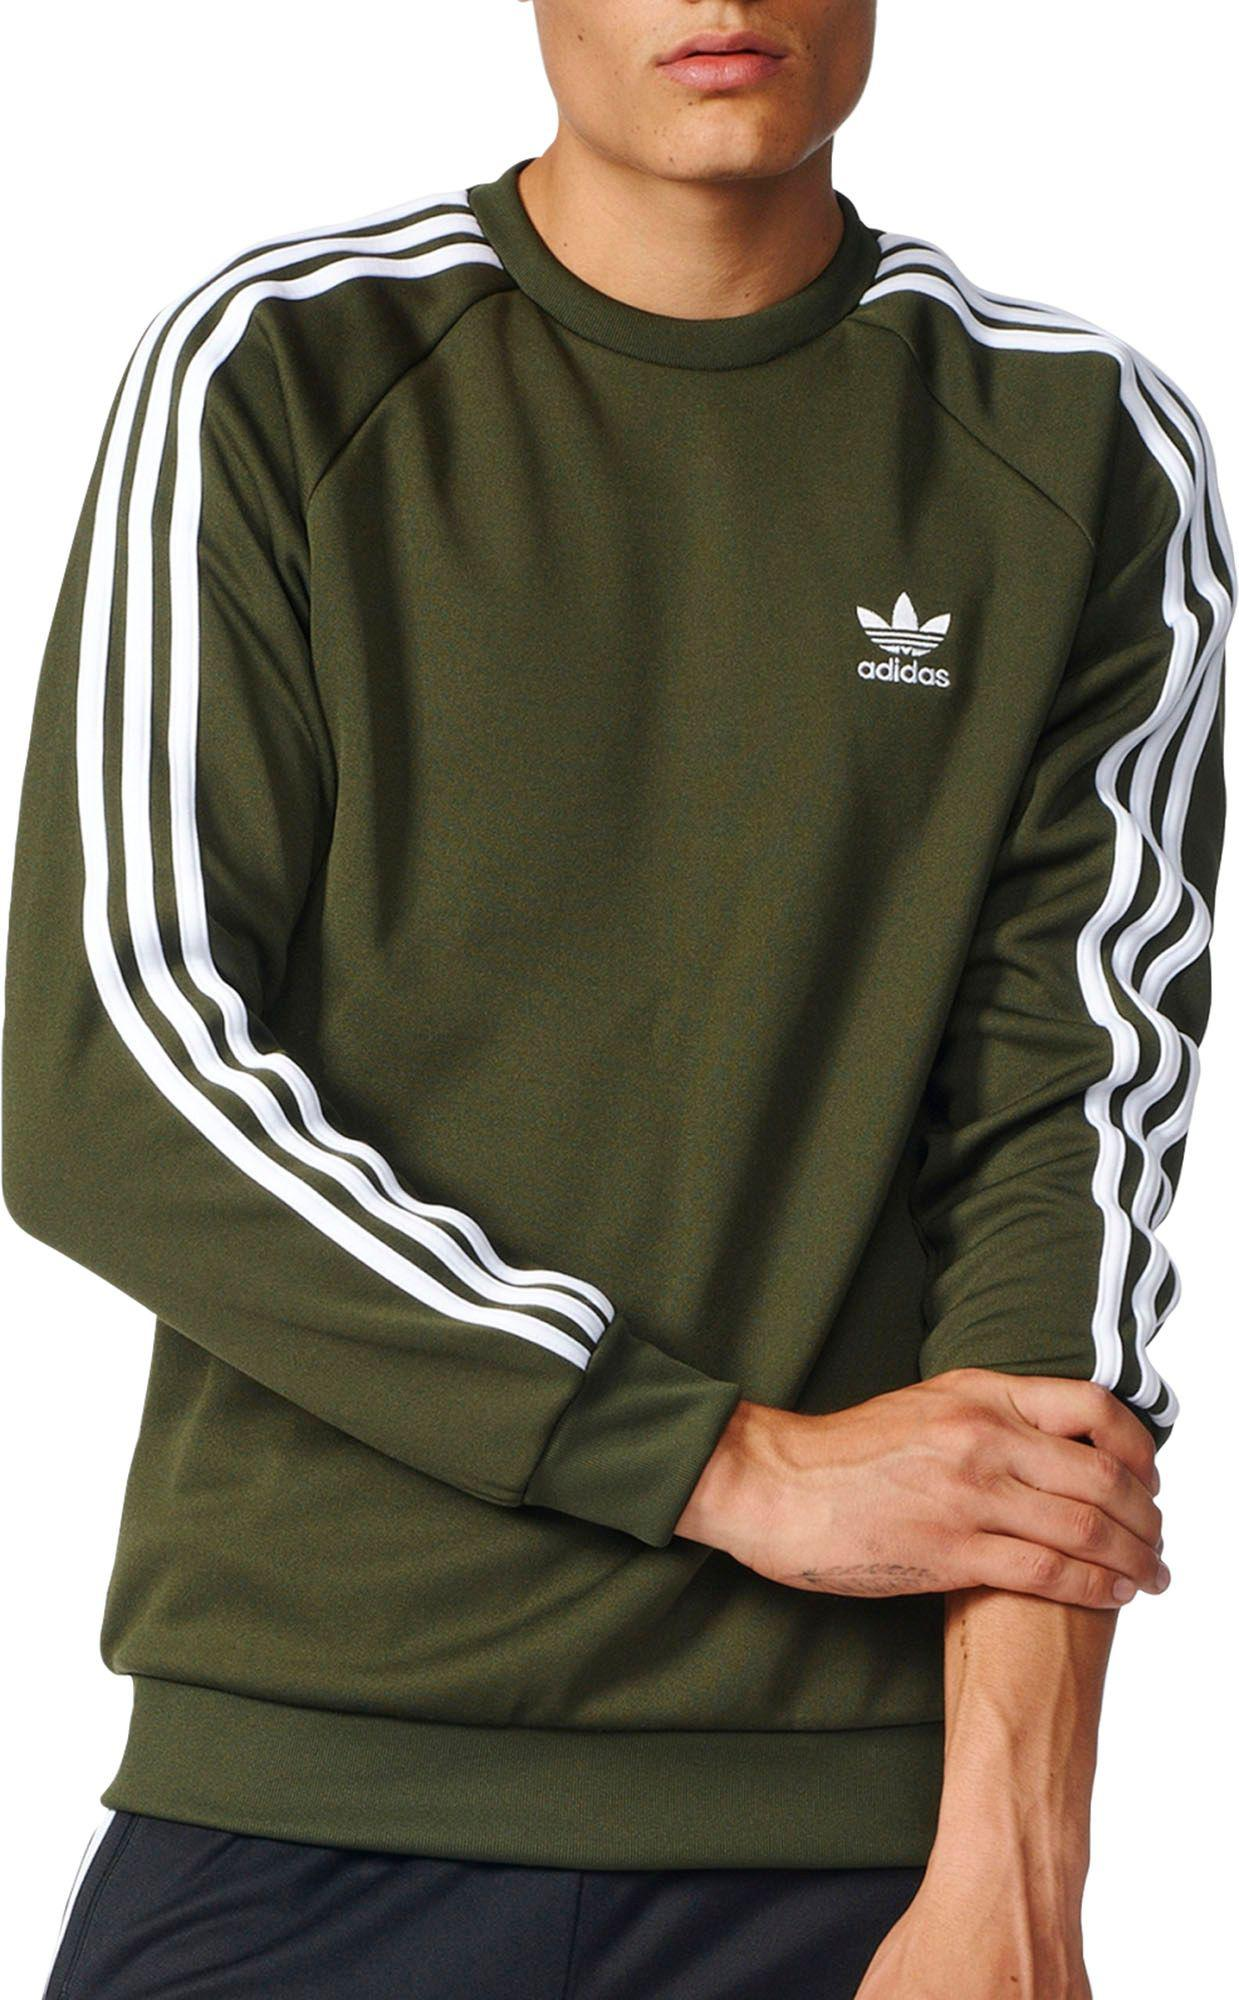 0c53a5433636 Lyst - adidas Originals Superstar Sweatshirt in Green for Men